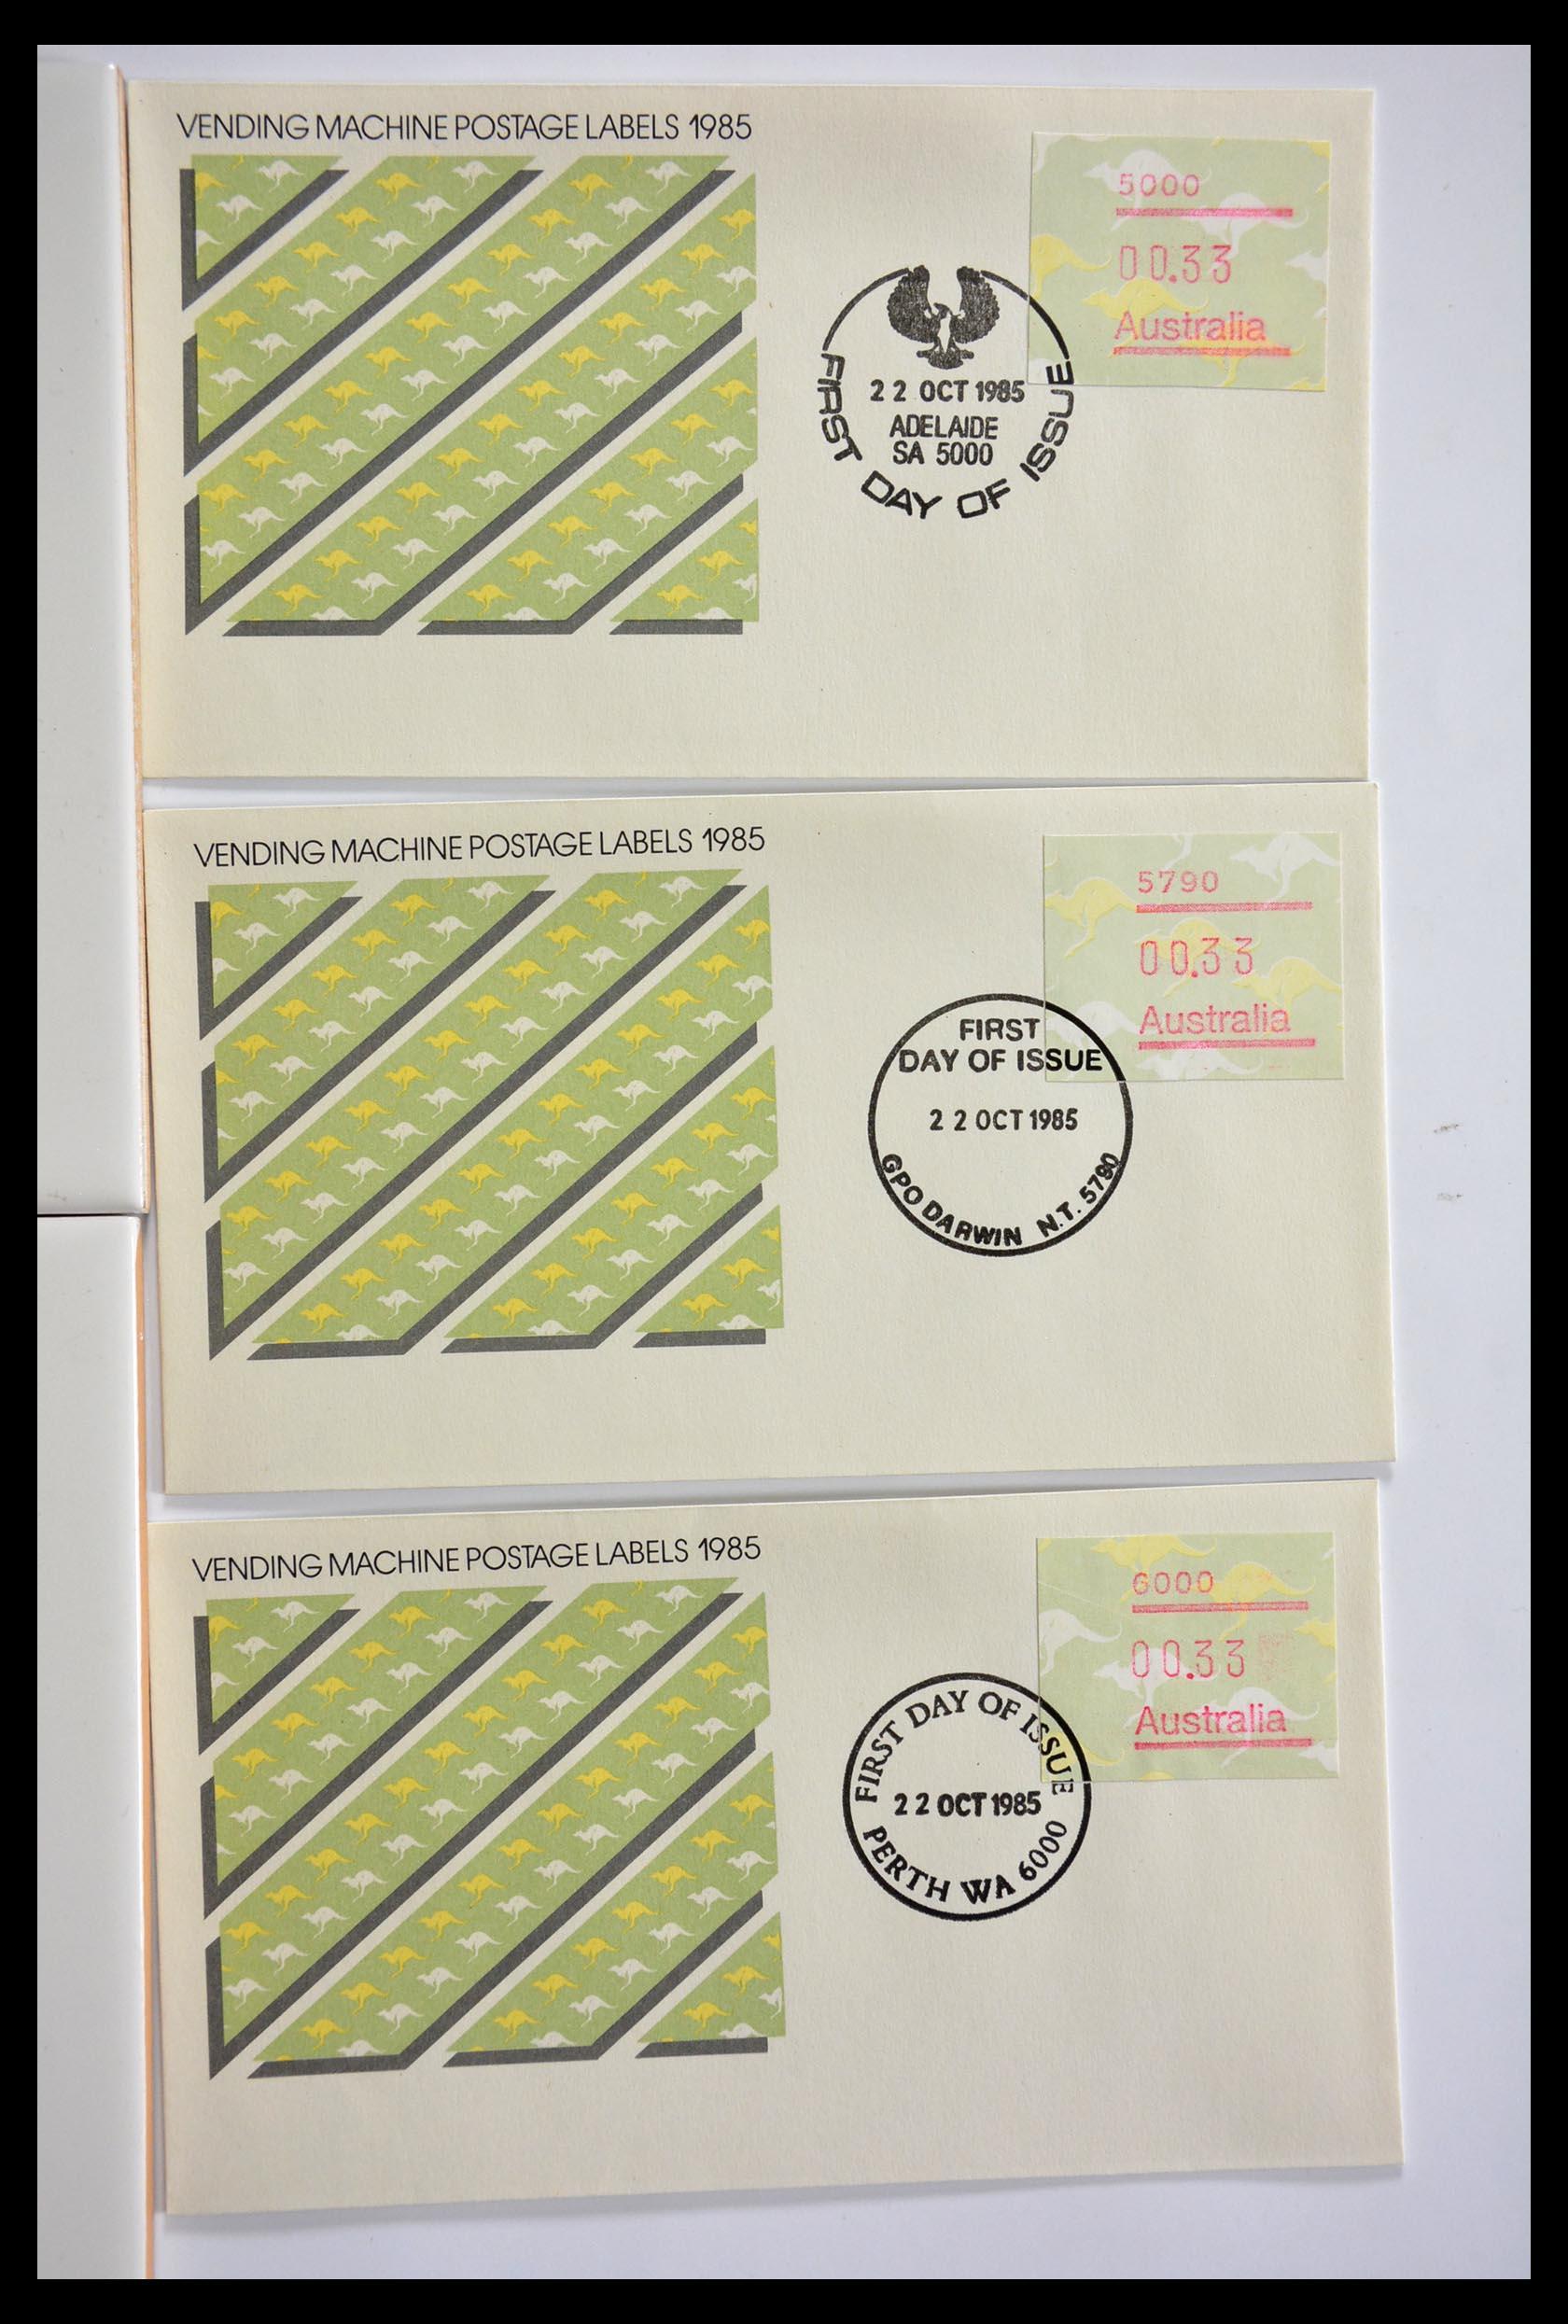 29353 004 - 29353 West Europa automaatzegels.